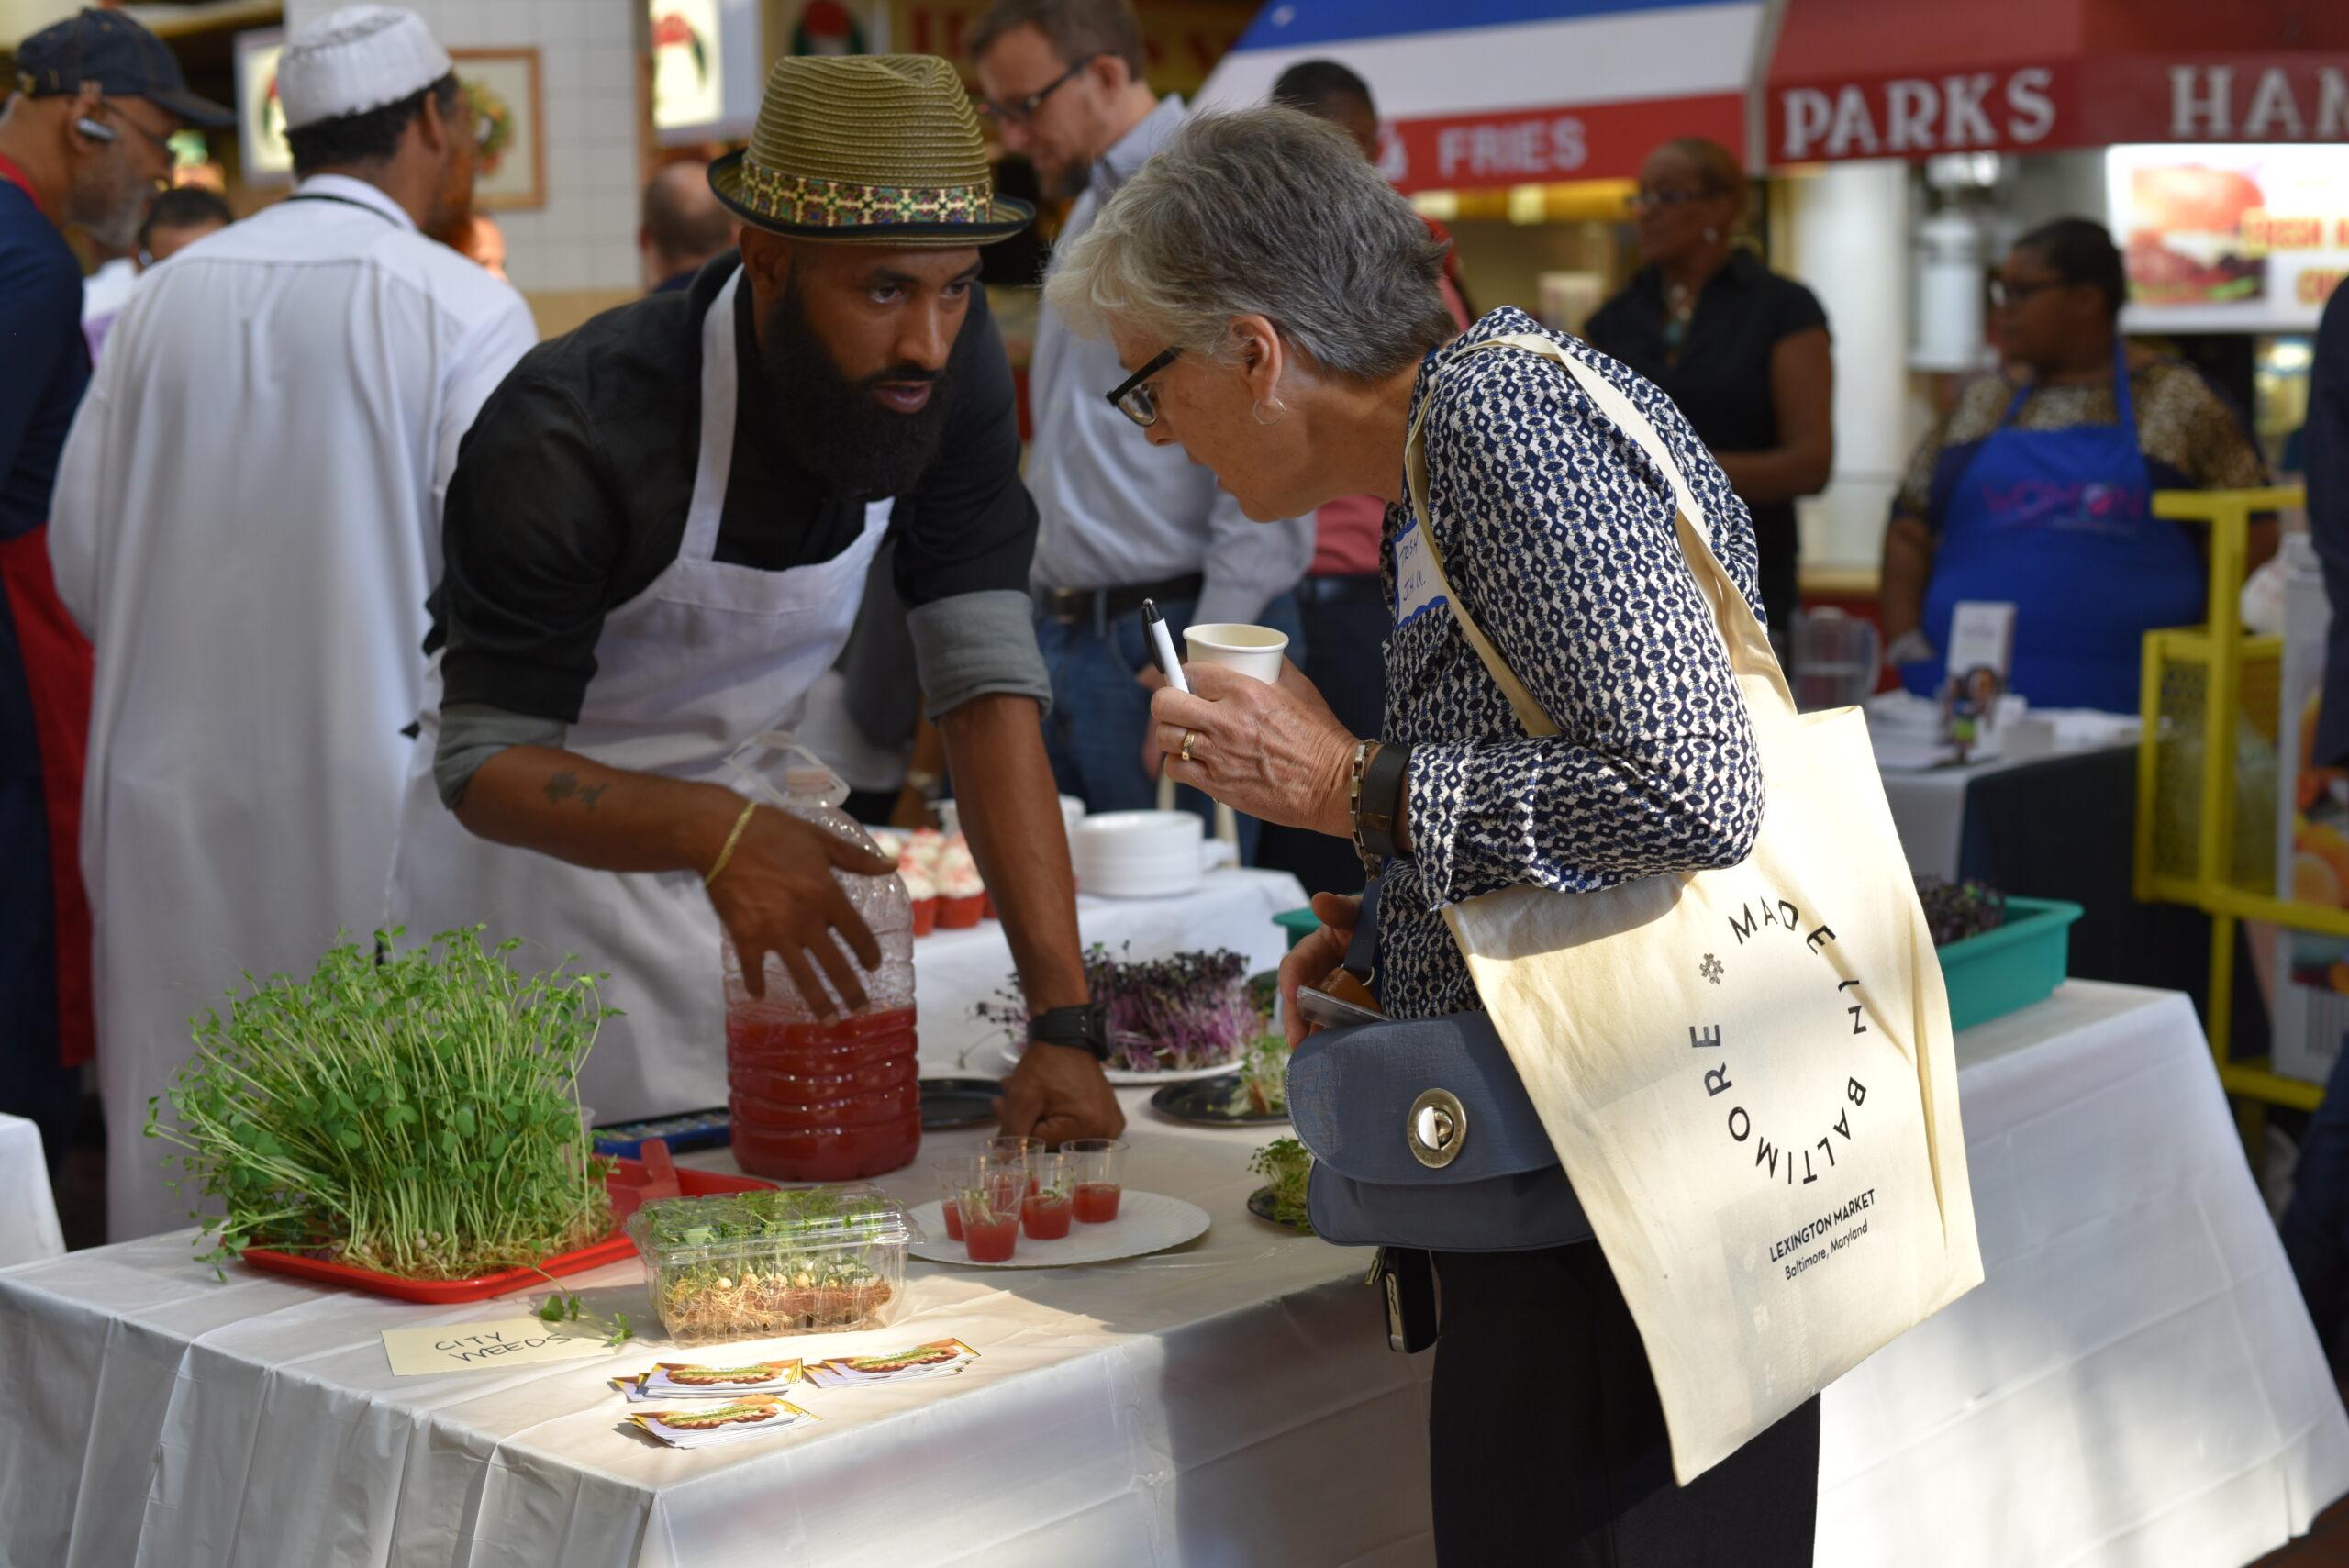 2nd Annual #MadeinBaltimore Vendor Fair